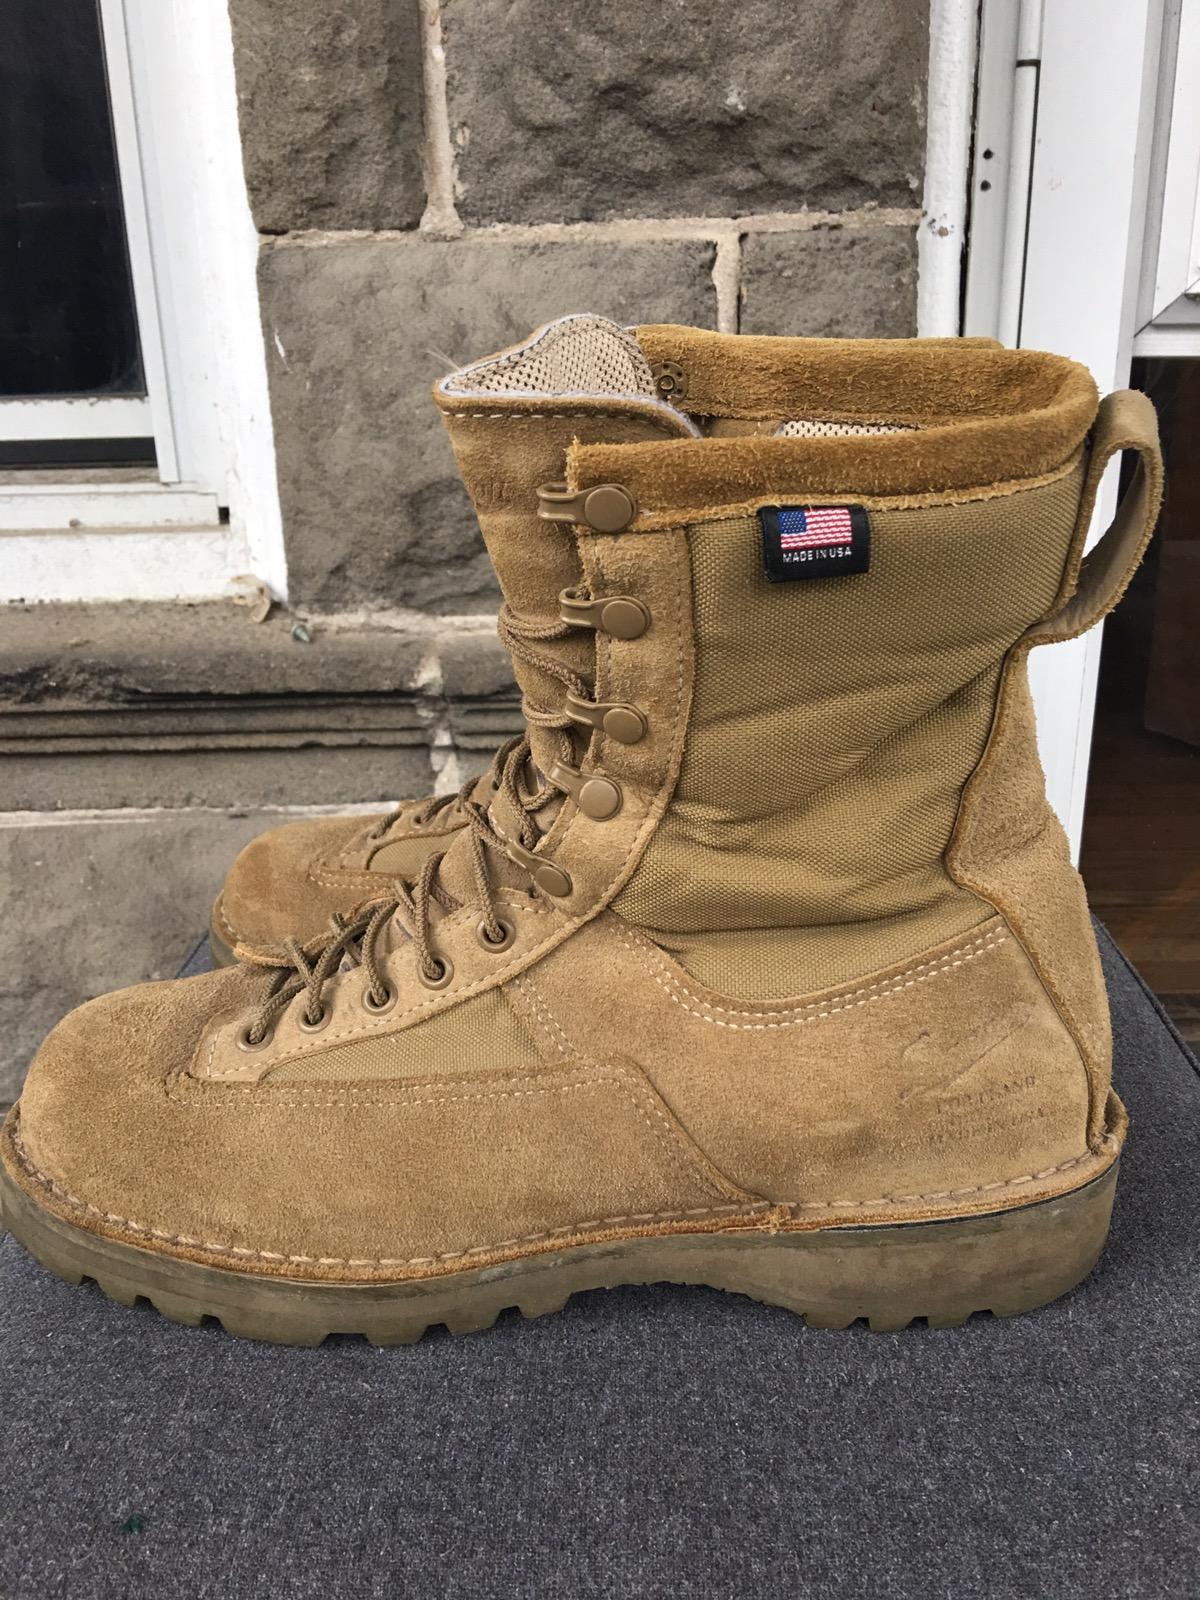 USA Military Boots (26000 Desert Acadia)